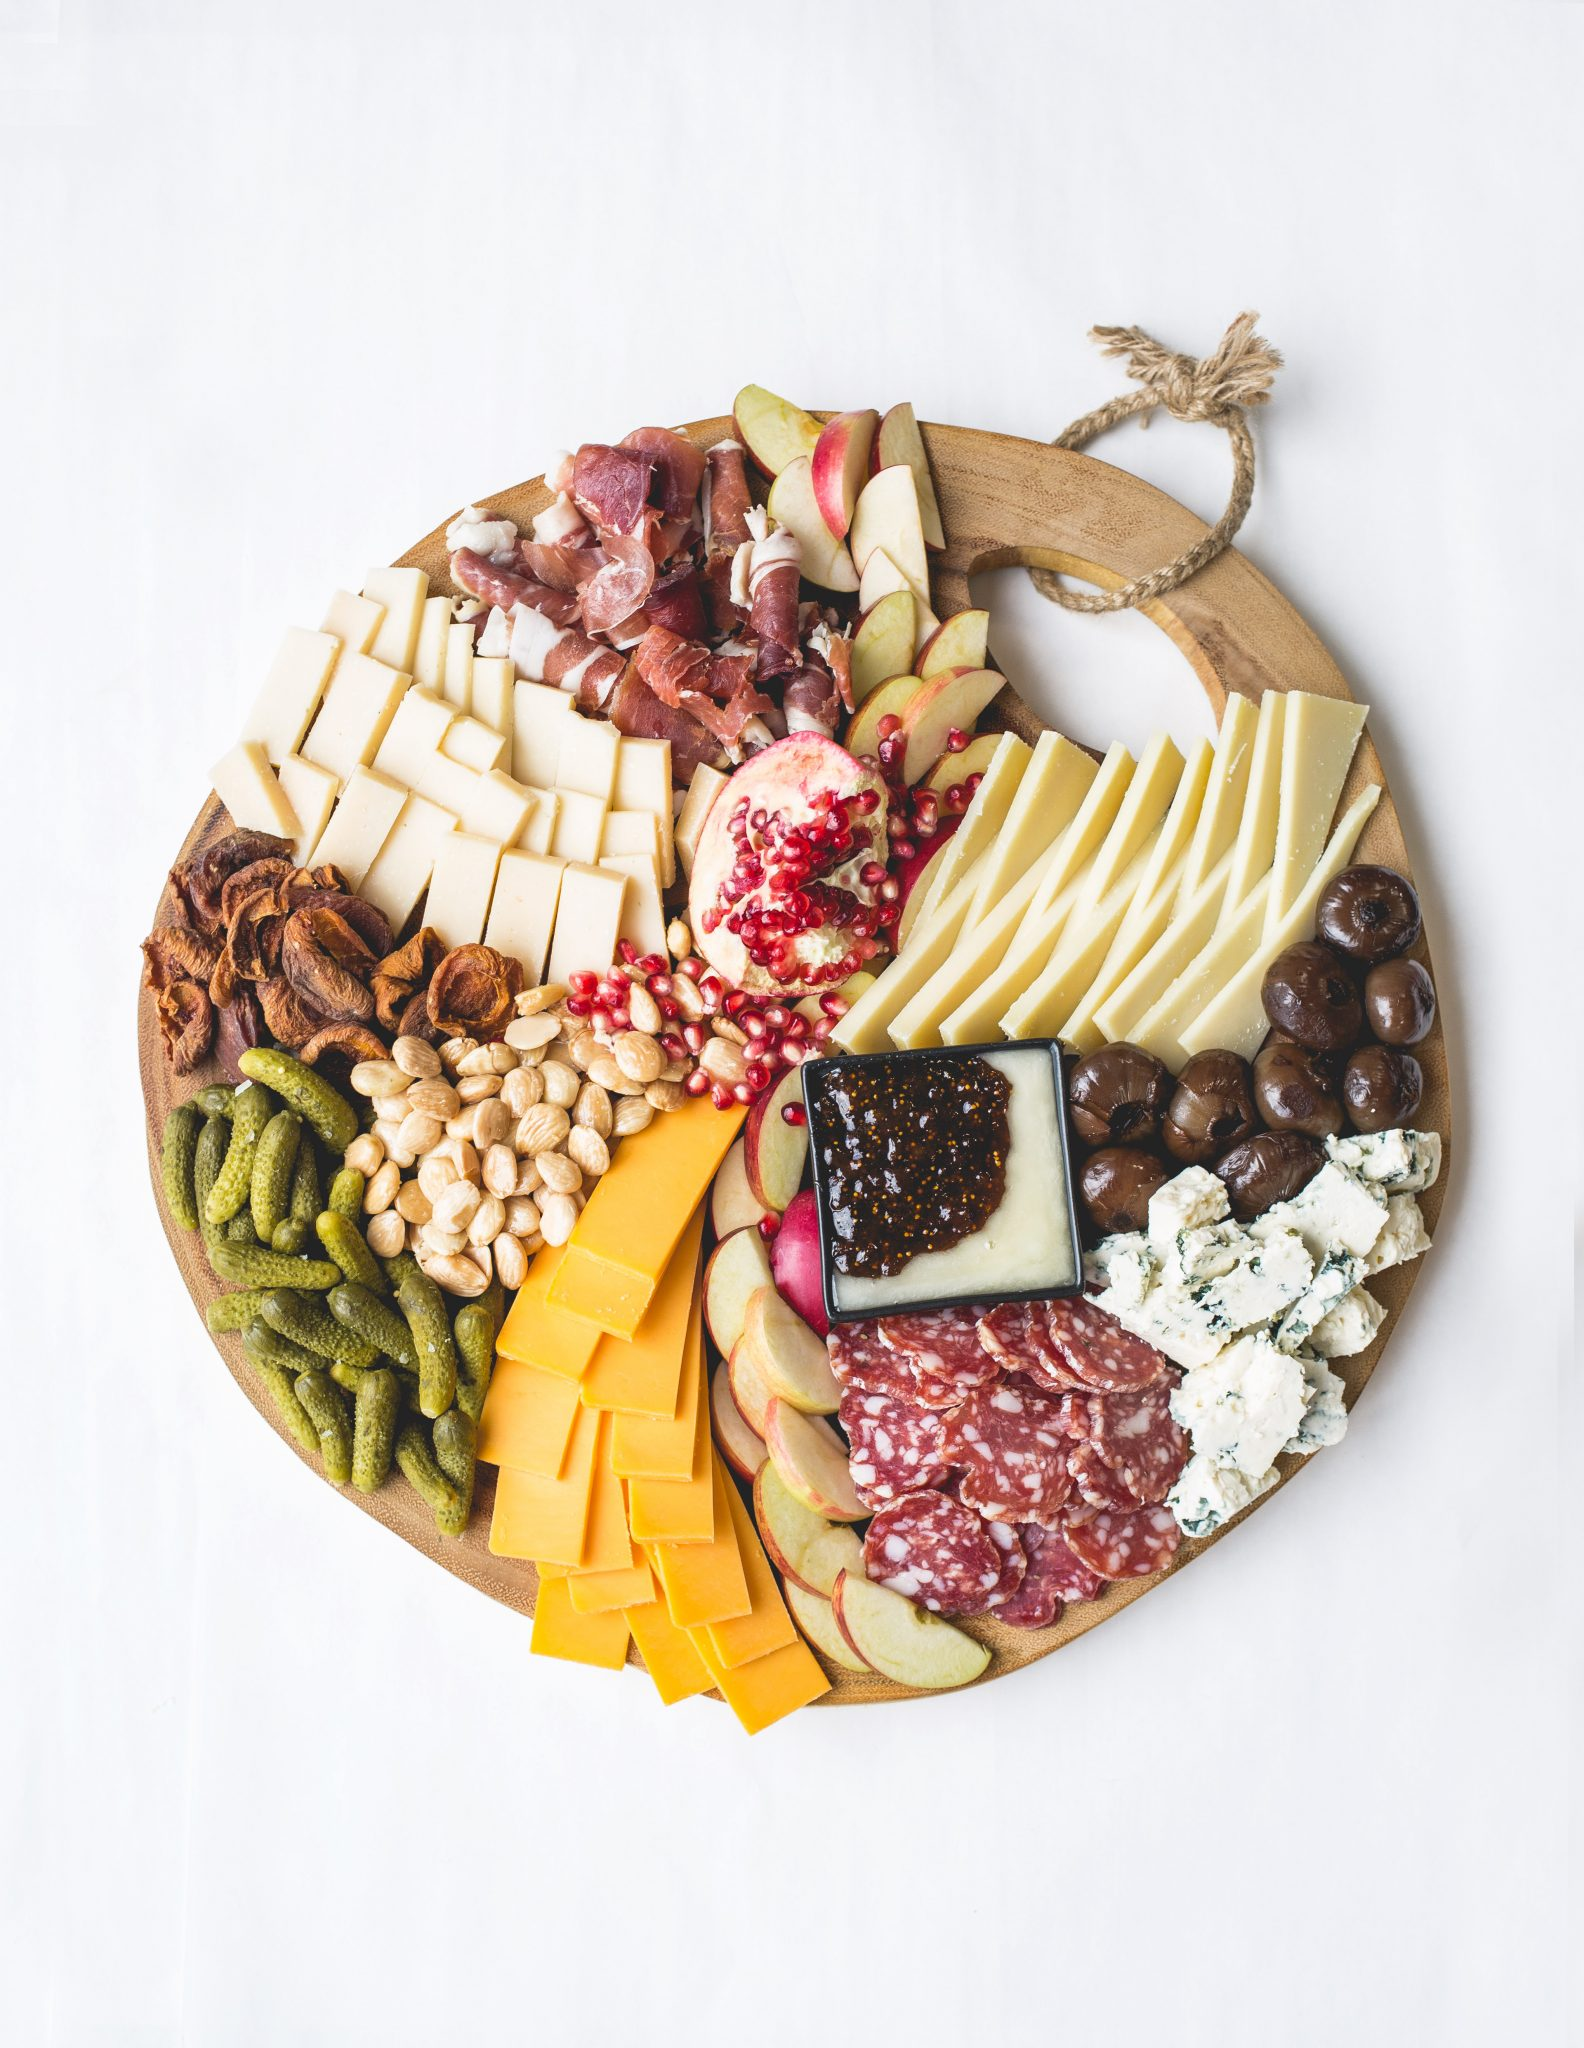 American Artisan Cheese Platter Zingerman S Creamery